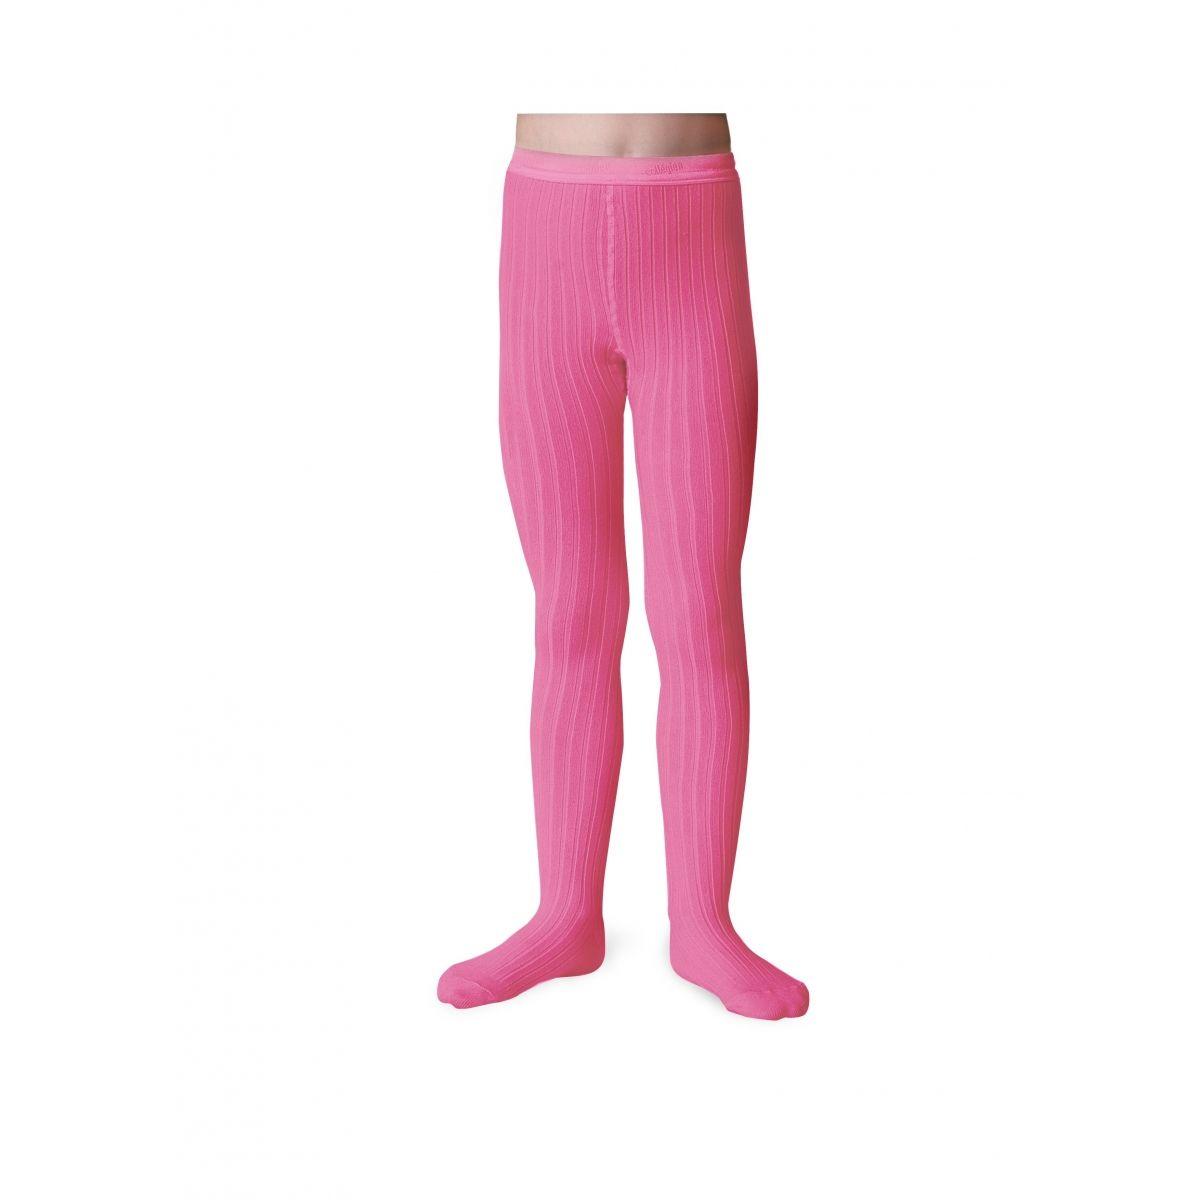 Rose fluo neon pink - Collégien